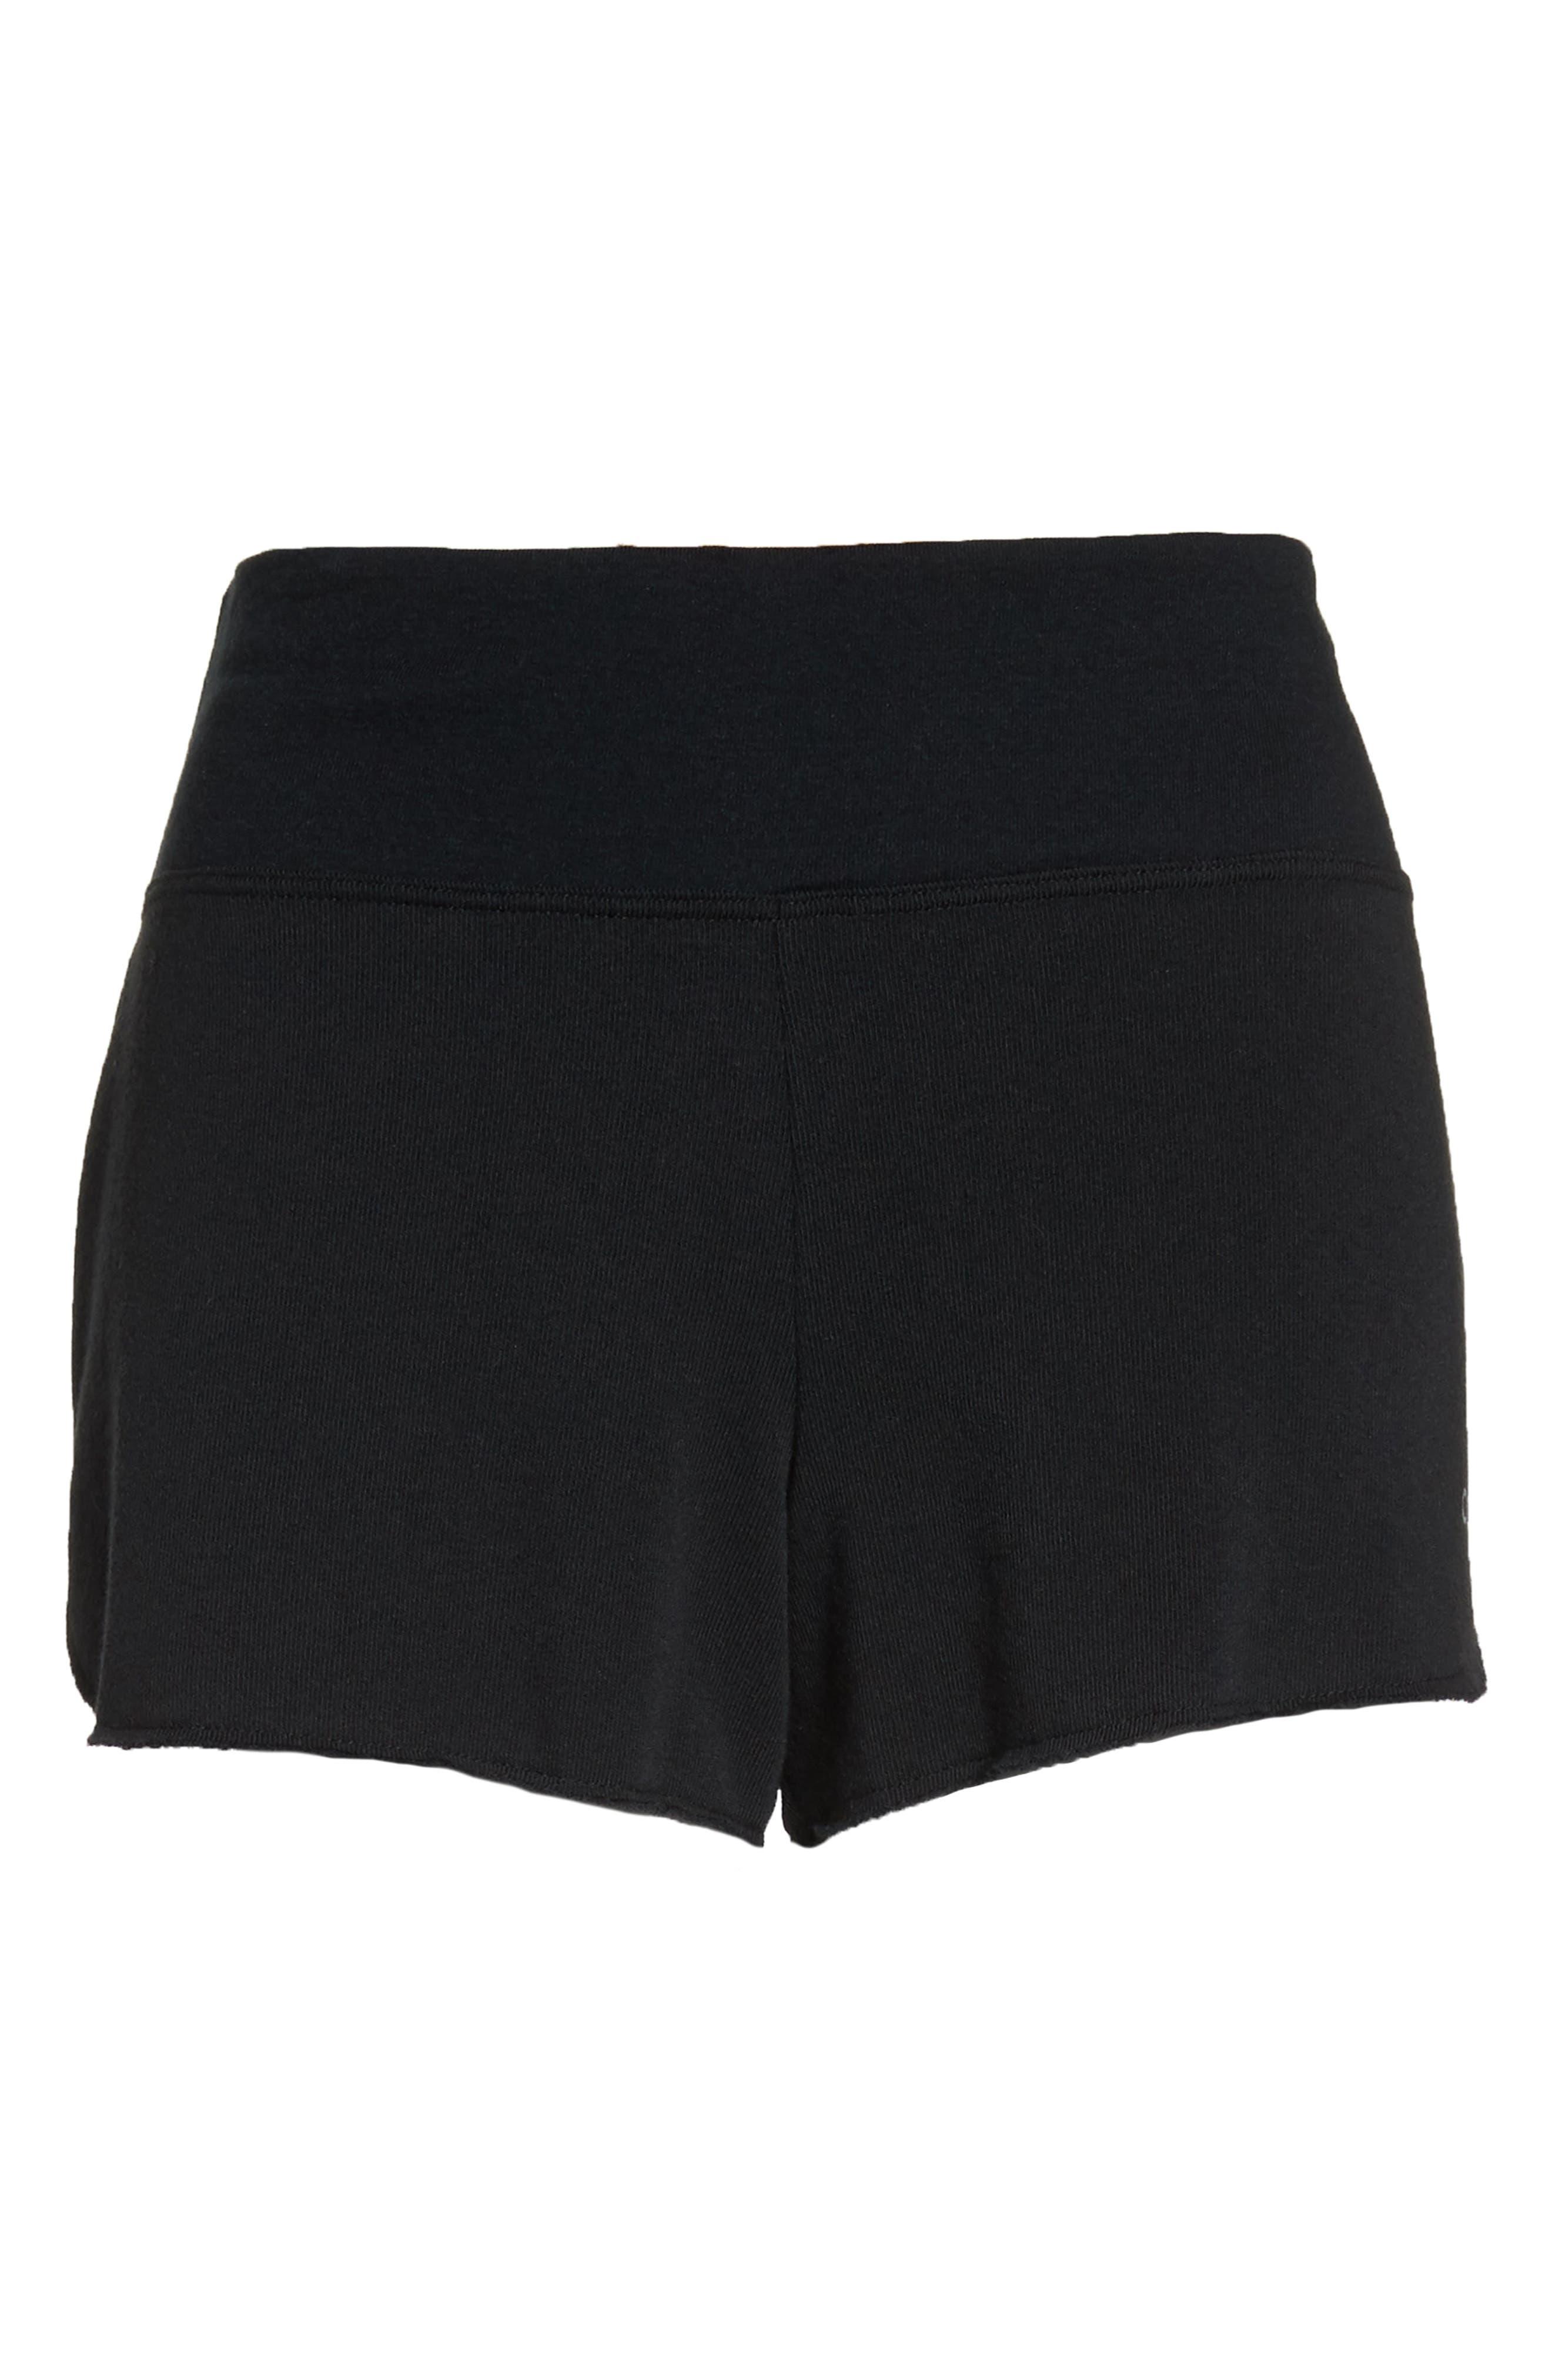 Boarder Shorts,                             Alternate thumbnail 6, color,                             Black